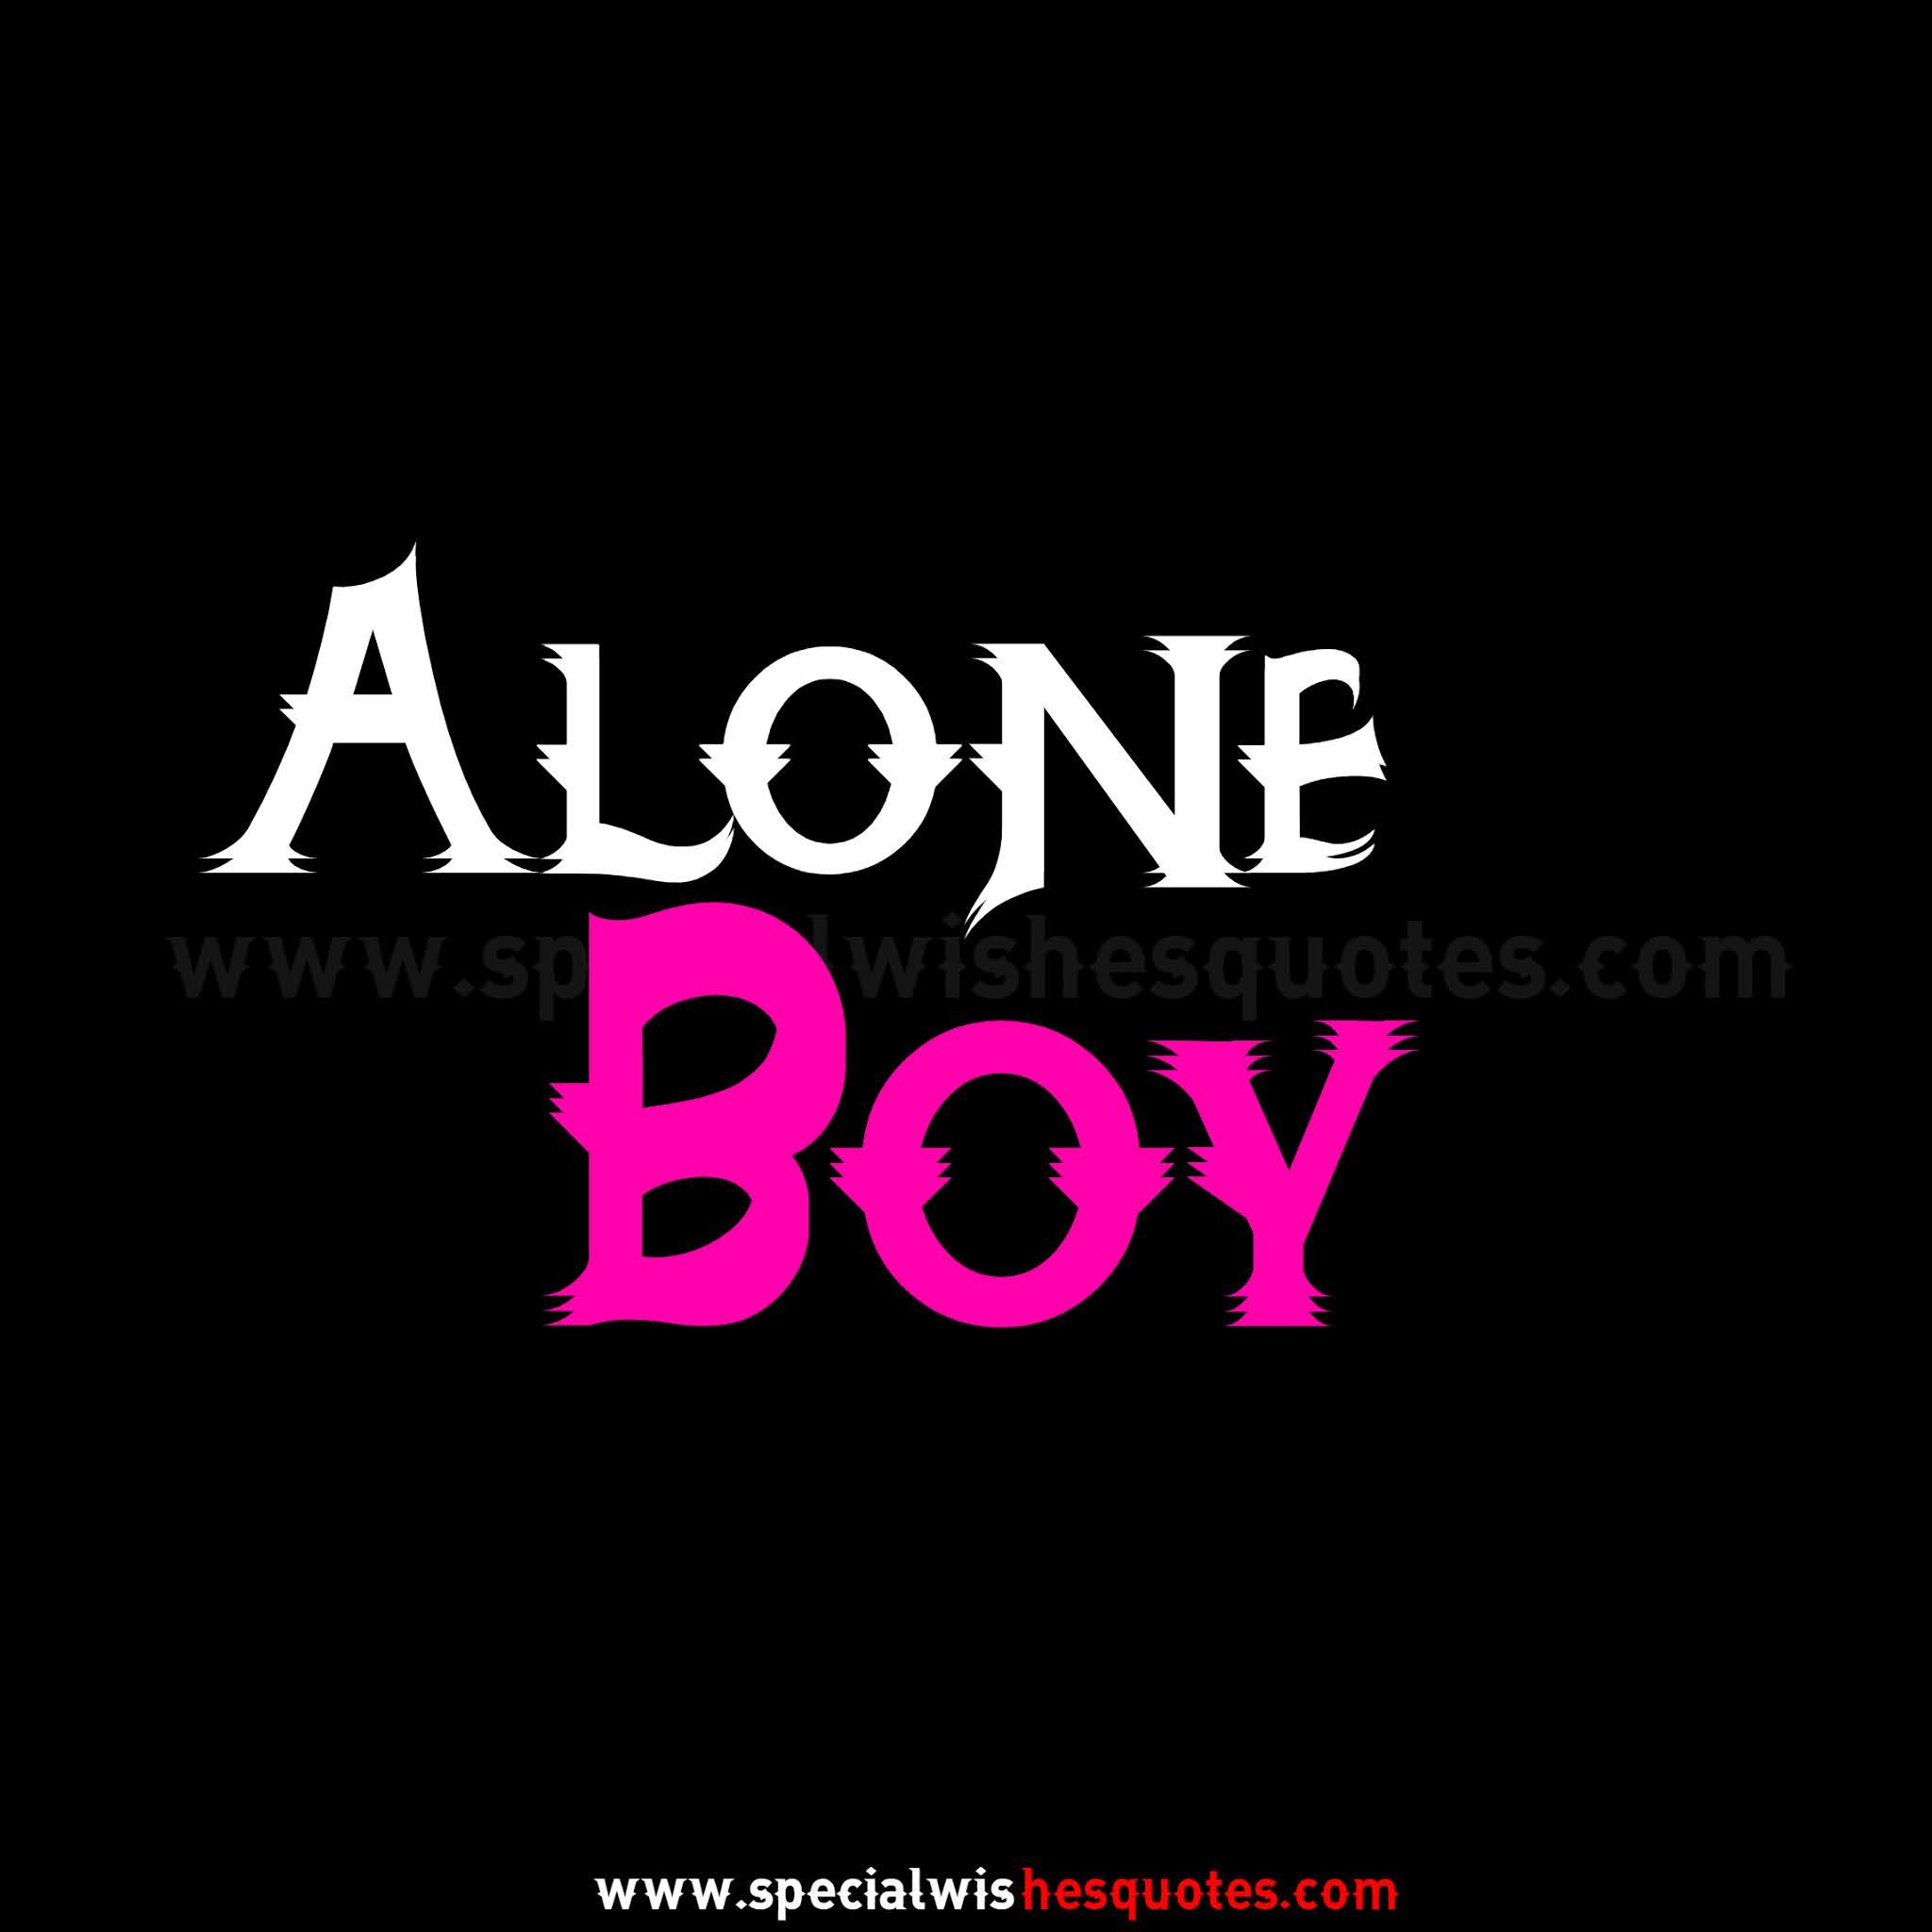 'Alone Boy Attitude Dp For Boys For Whatsapp'